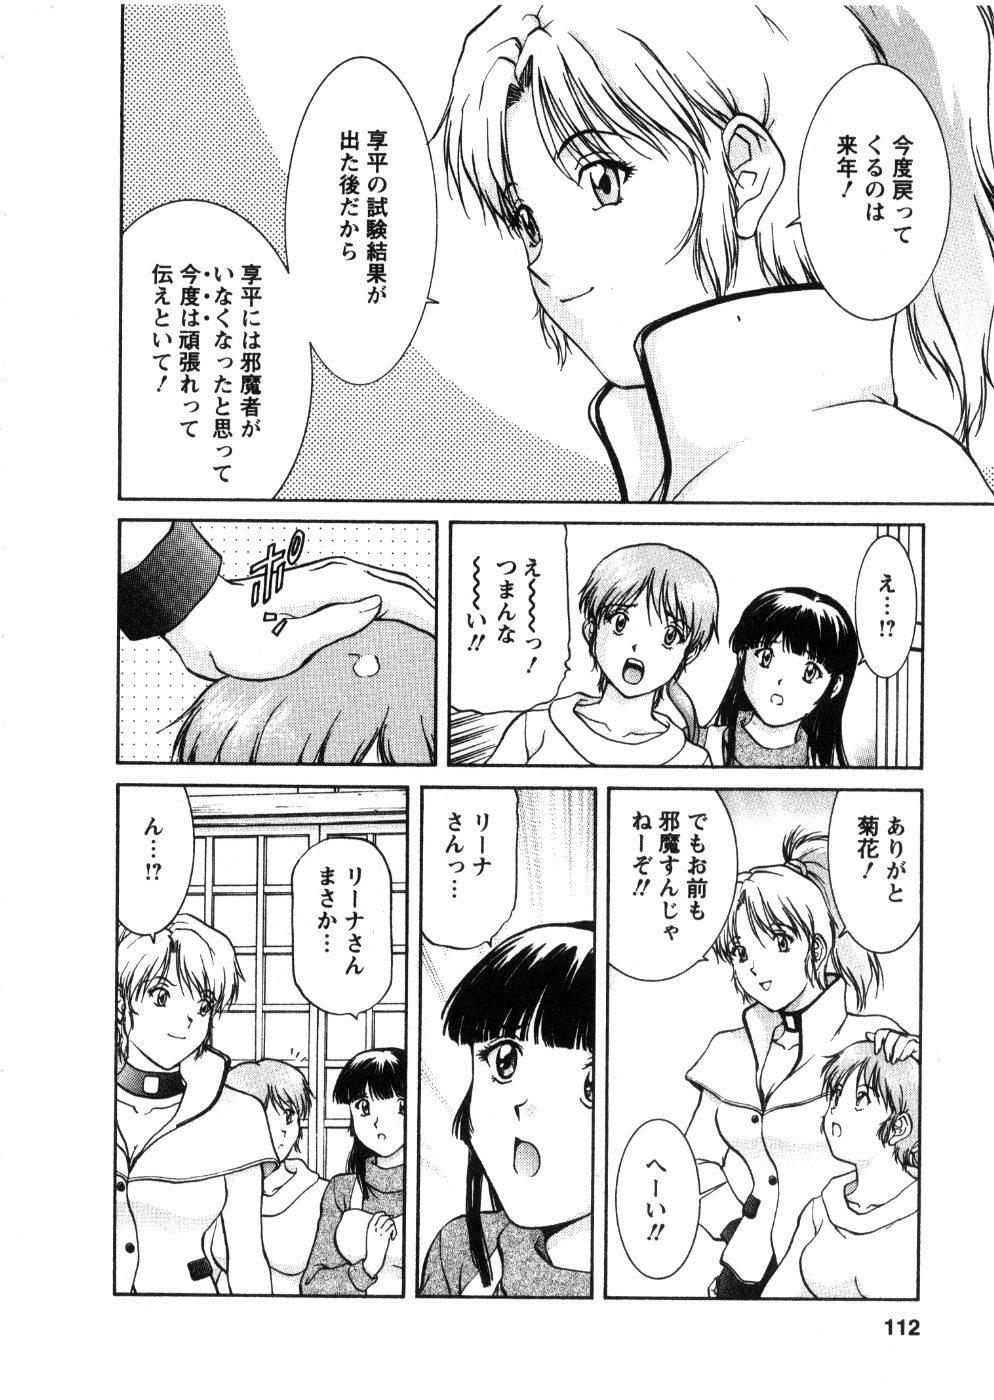 Oneechan-tachi ga Yatte Kuru 03 113